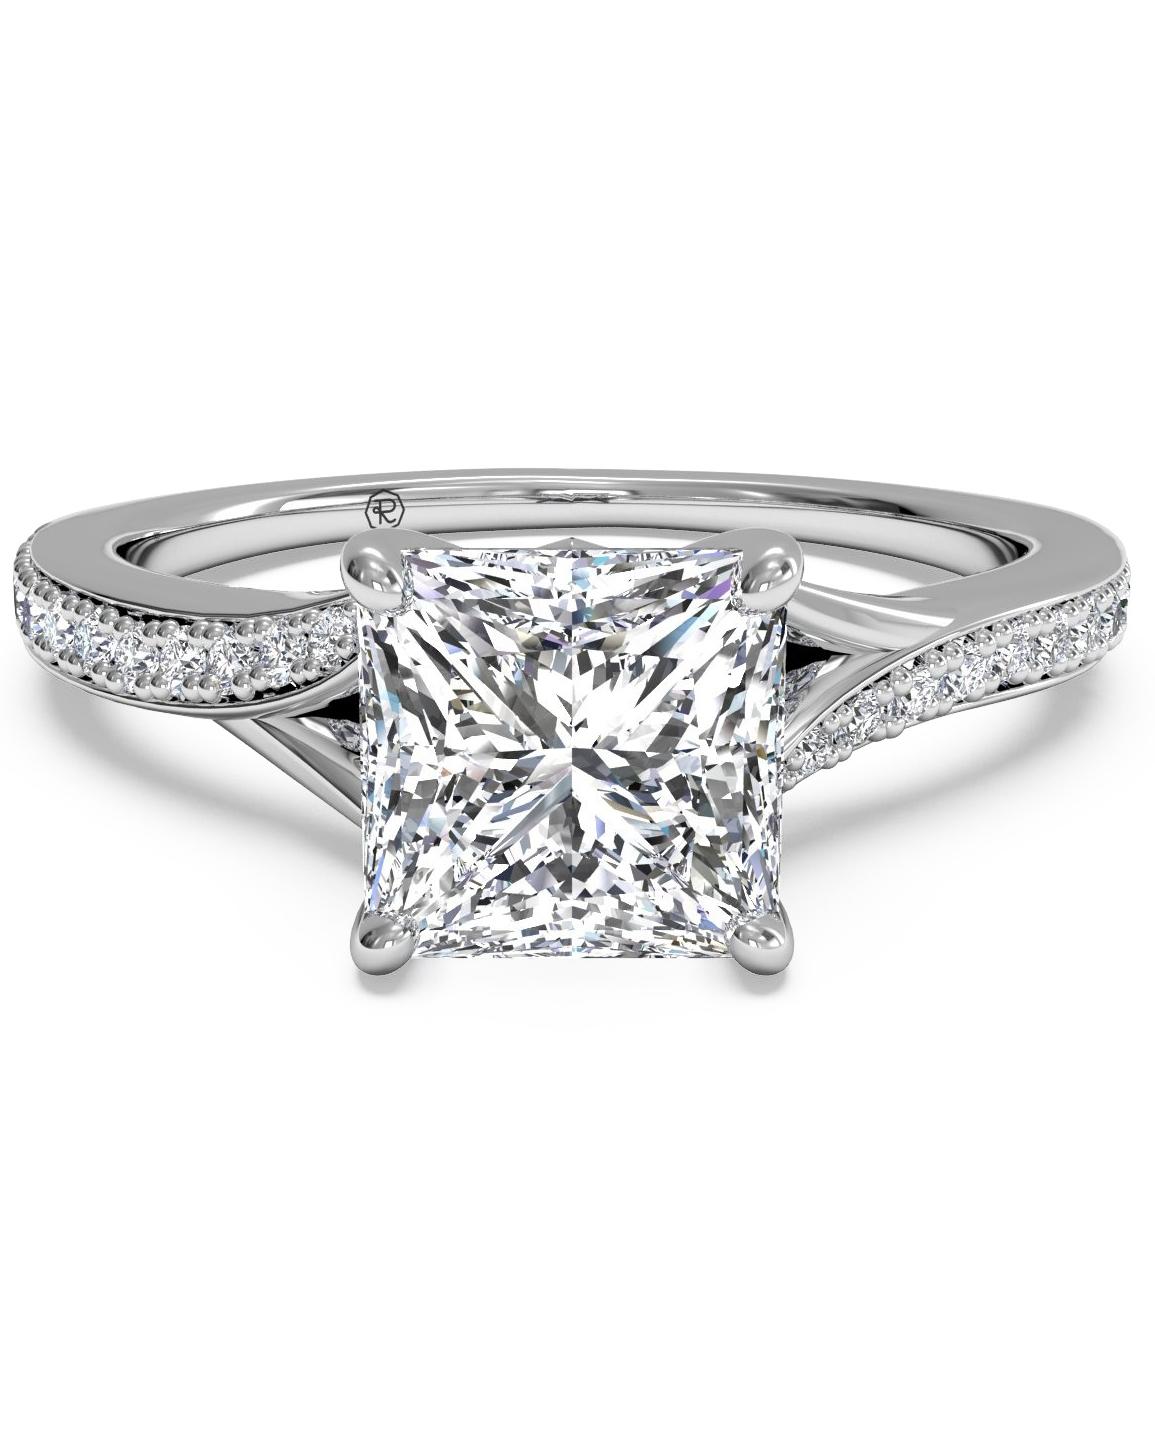 ritani-princess-cut-engagement-ring-two-0816.jpg